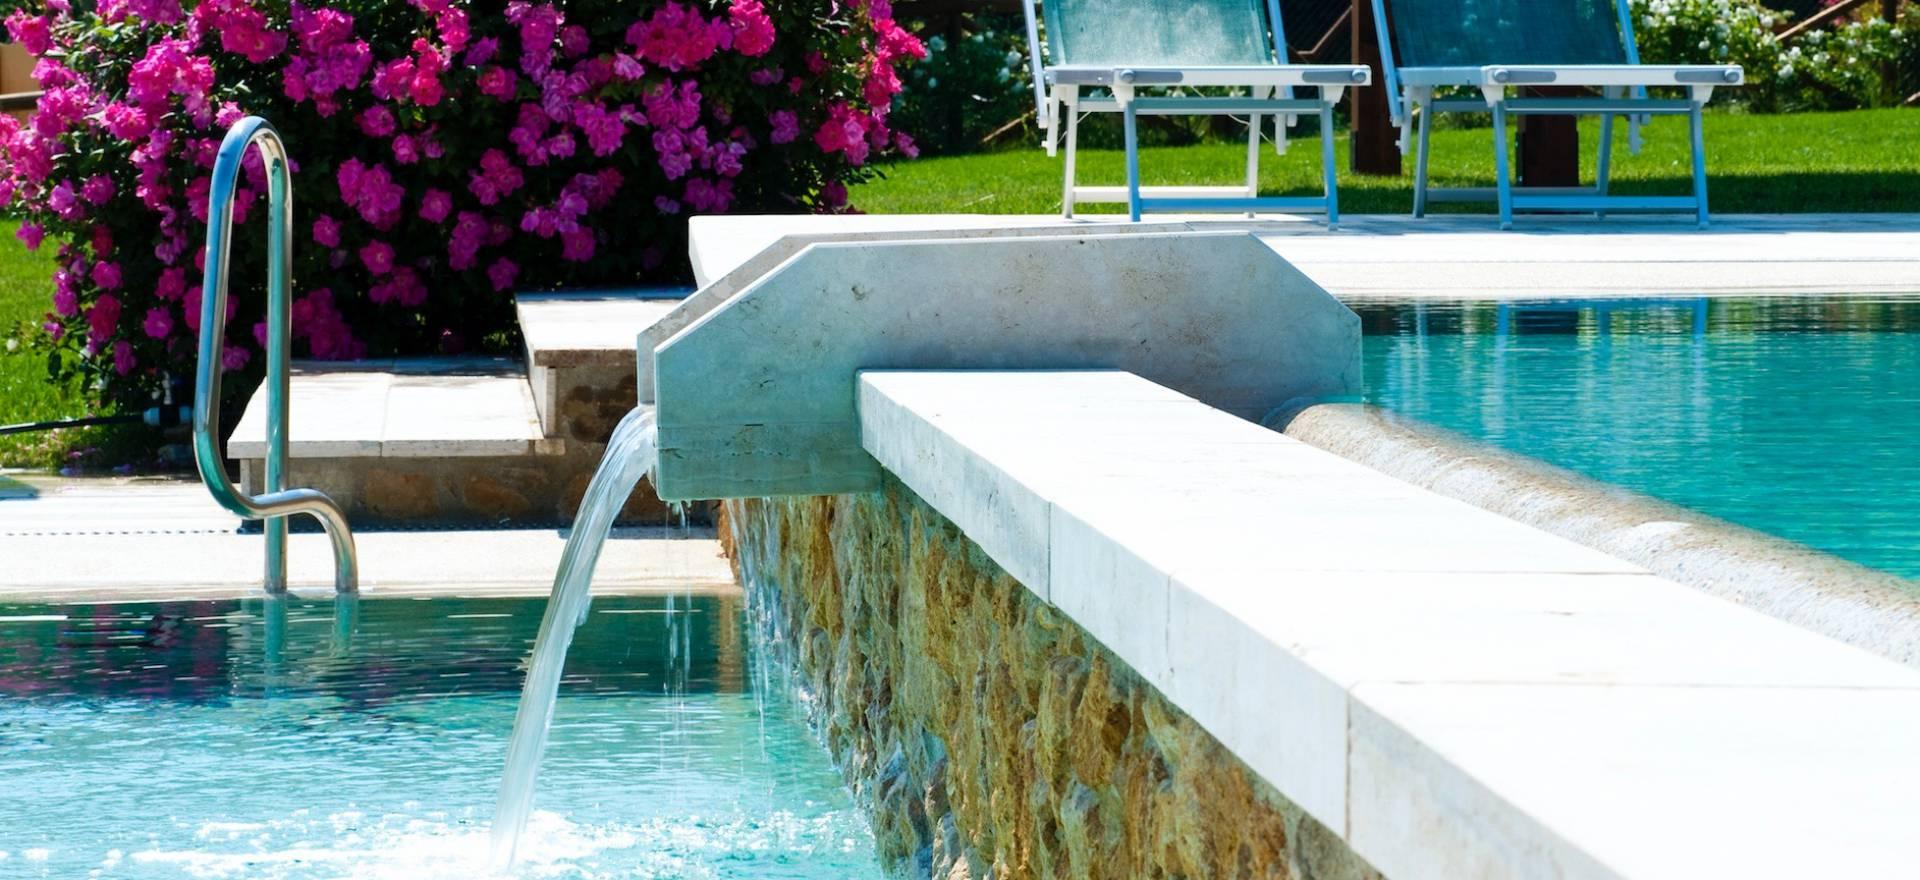 Agriturismo Toskana Agriturismo Country Resort Toskana mit tollem Pool